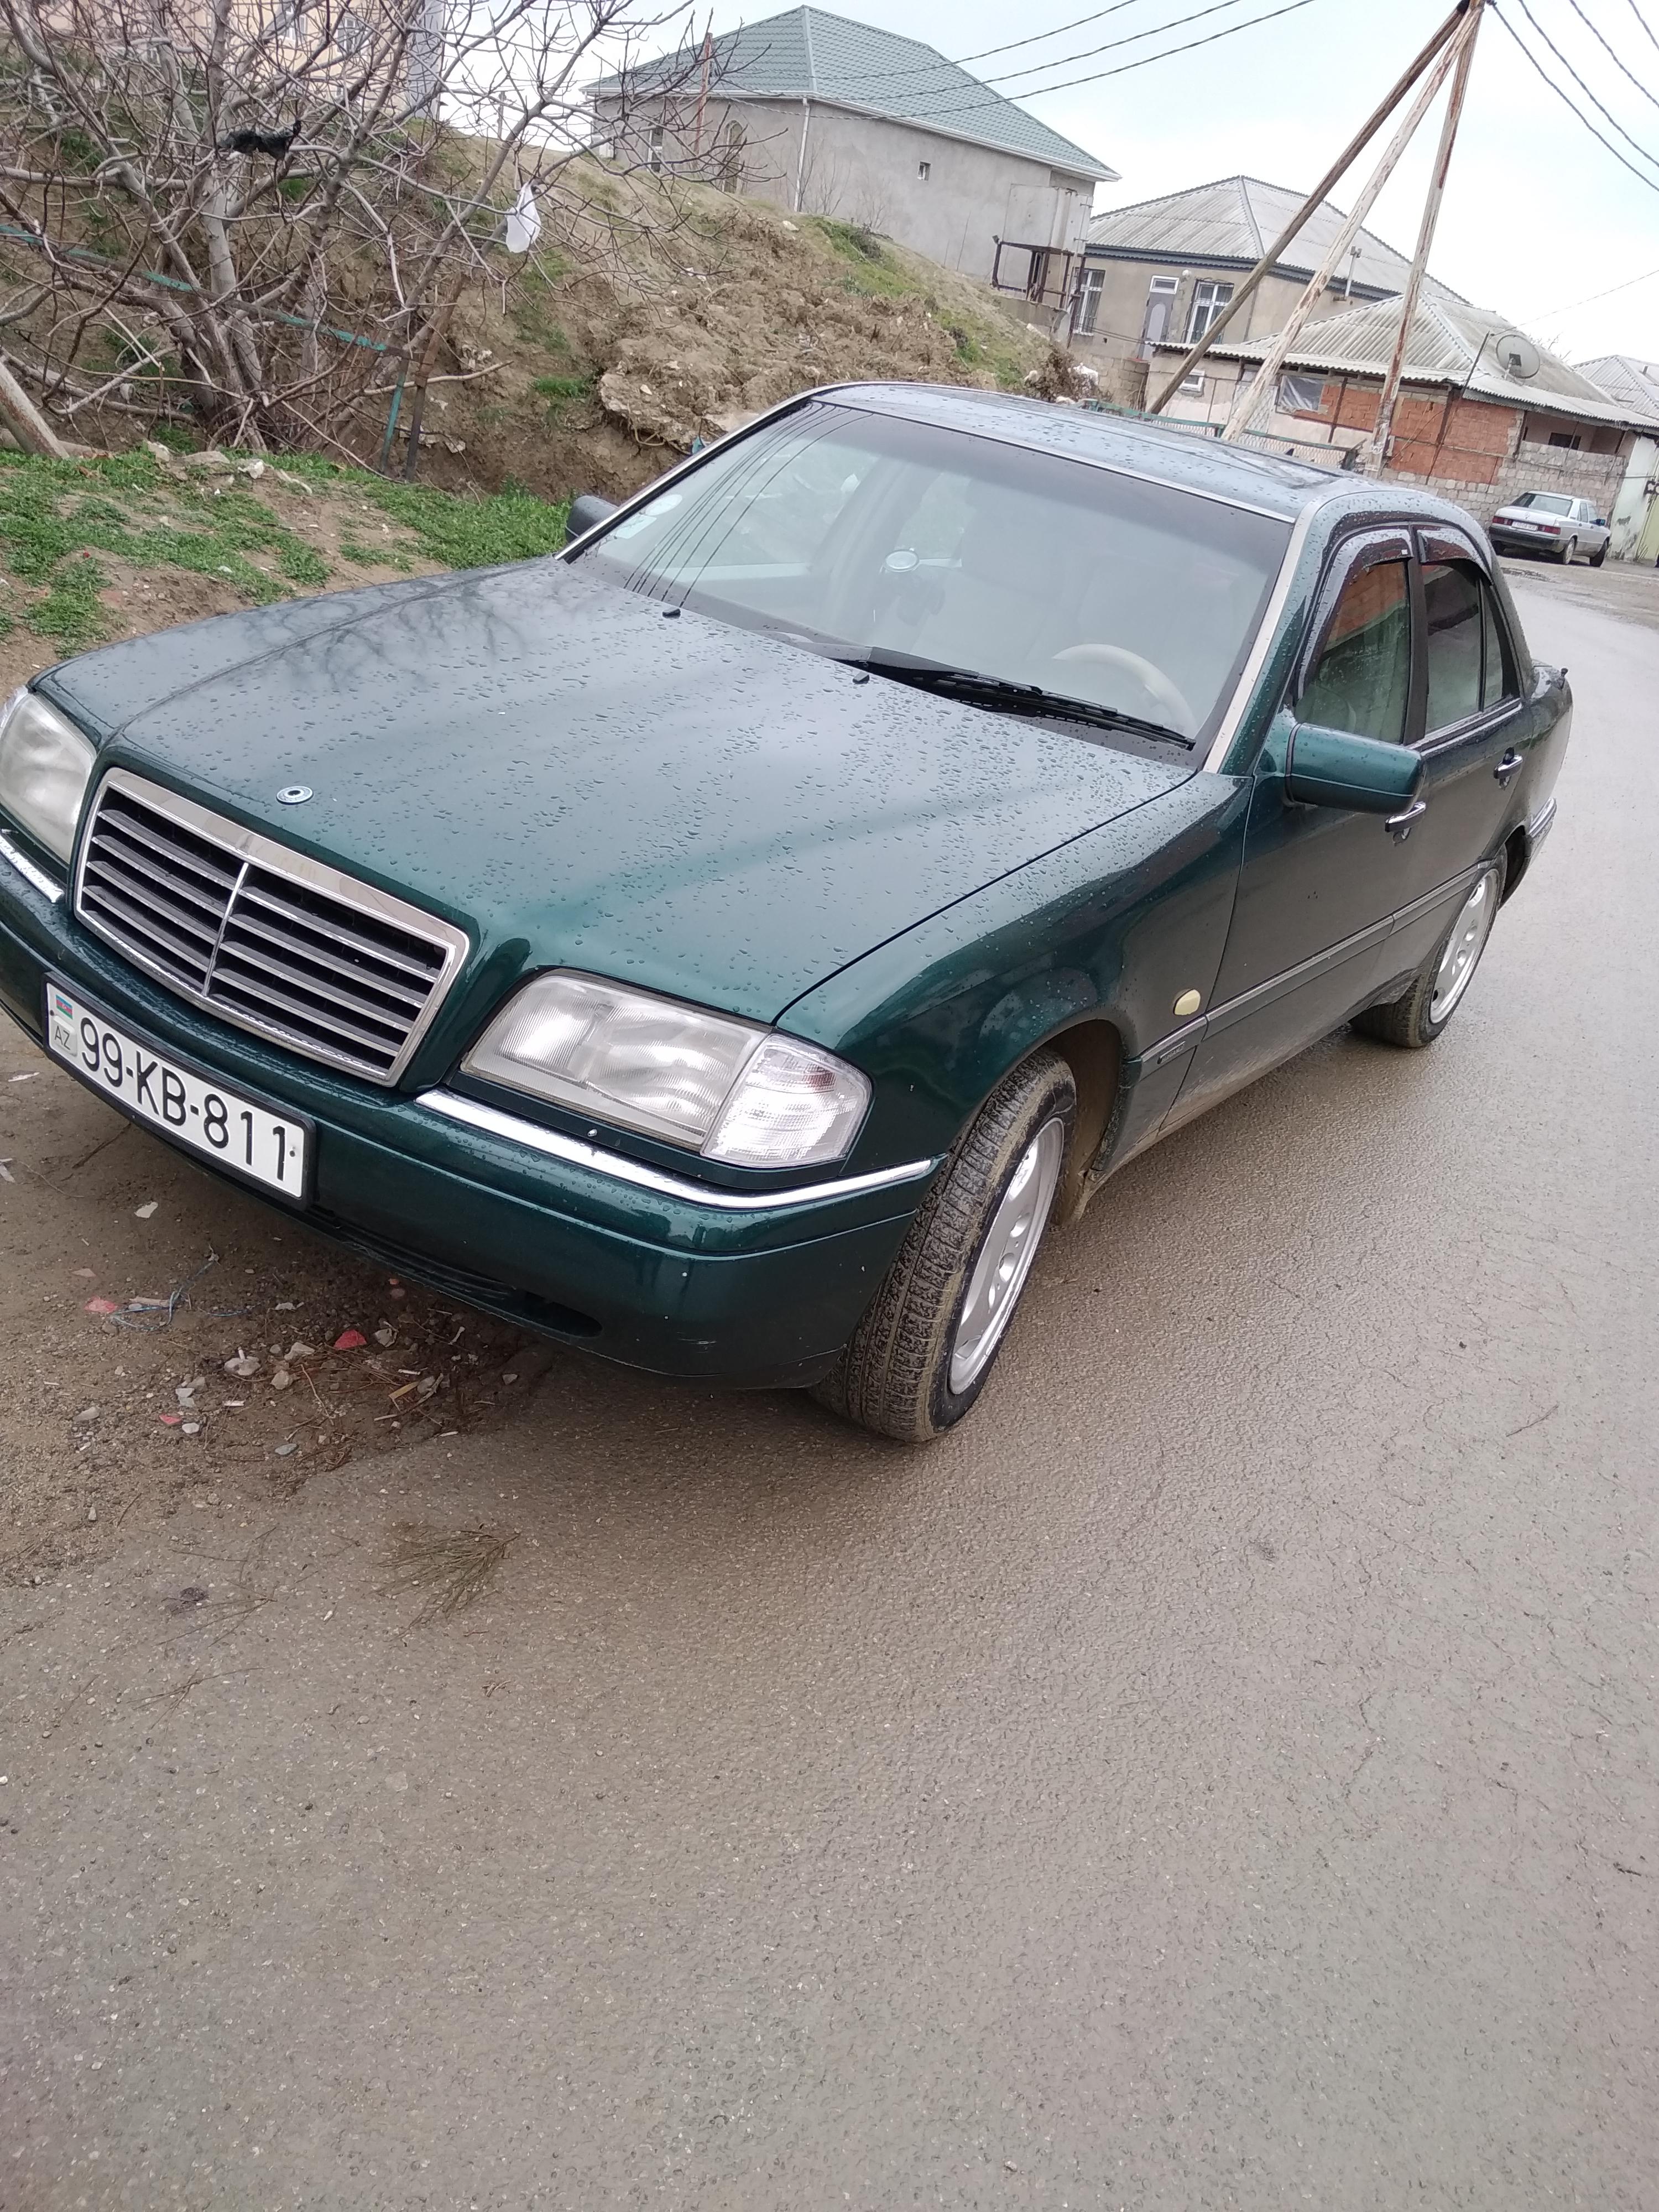 Mercedes-Benz C 180 1.8(lt) 1996 Second hand  $5000